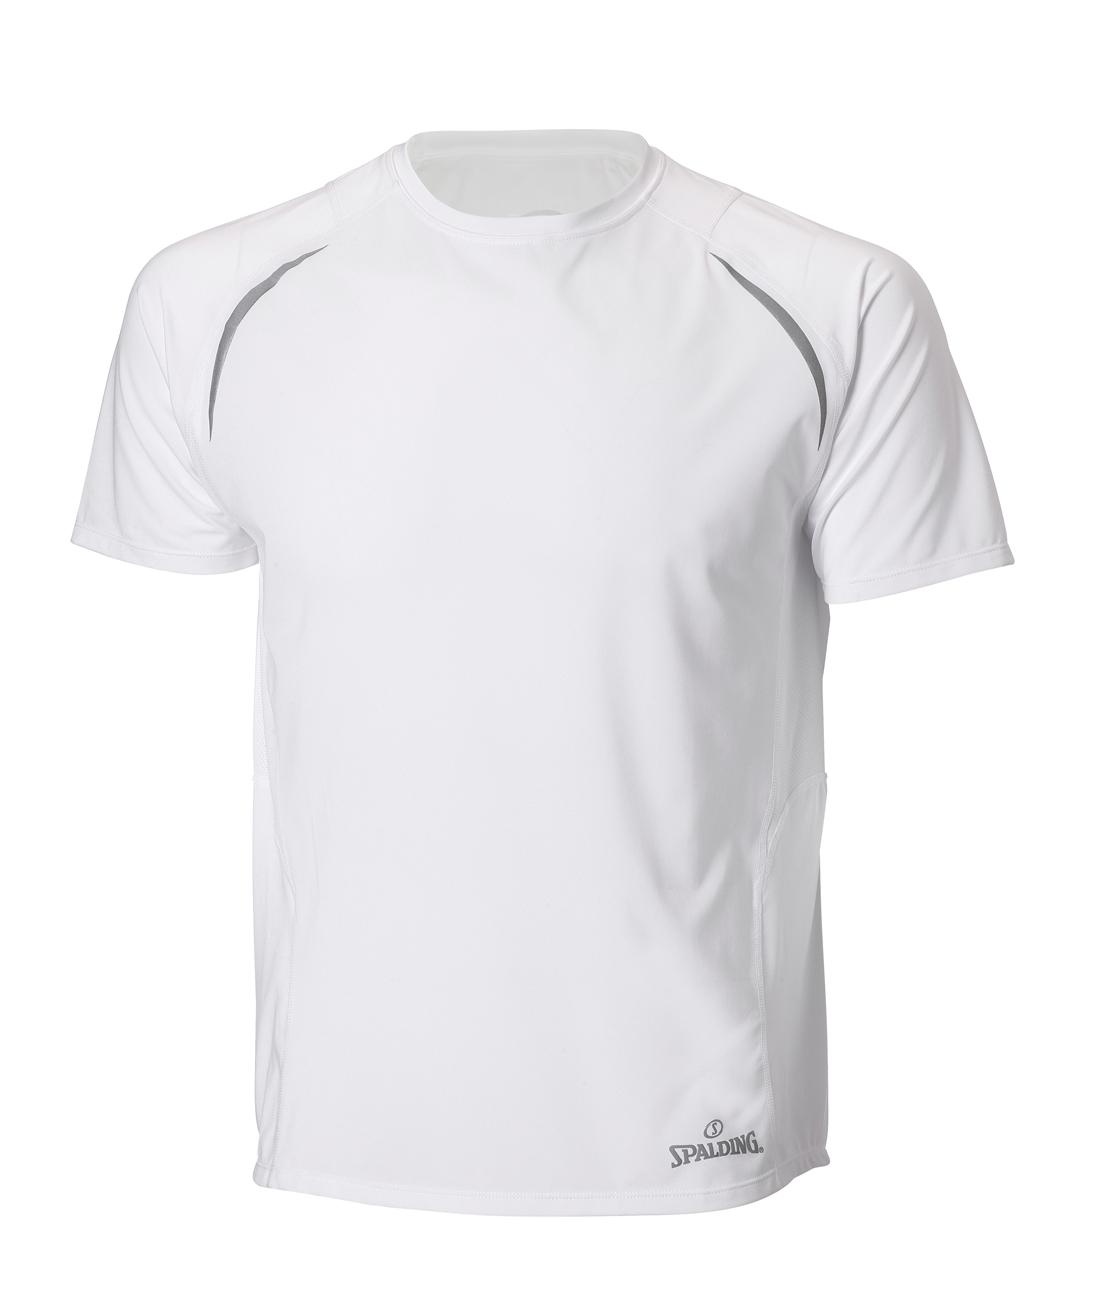 Spalding Endurance heren T-shirt Wit